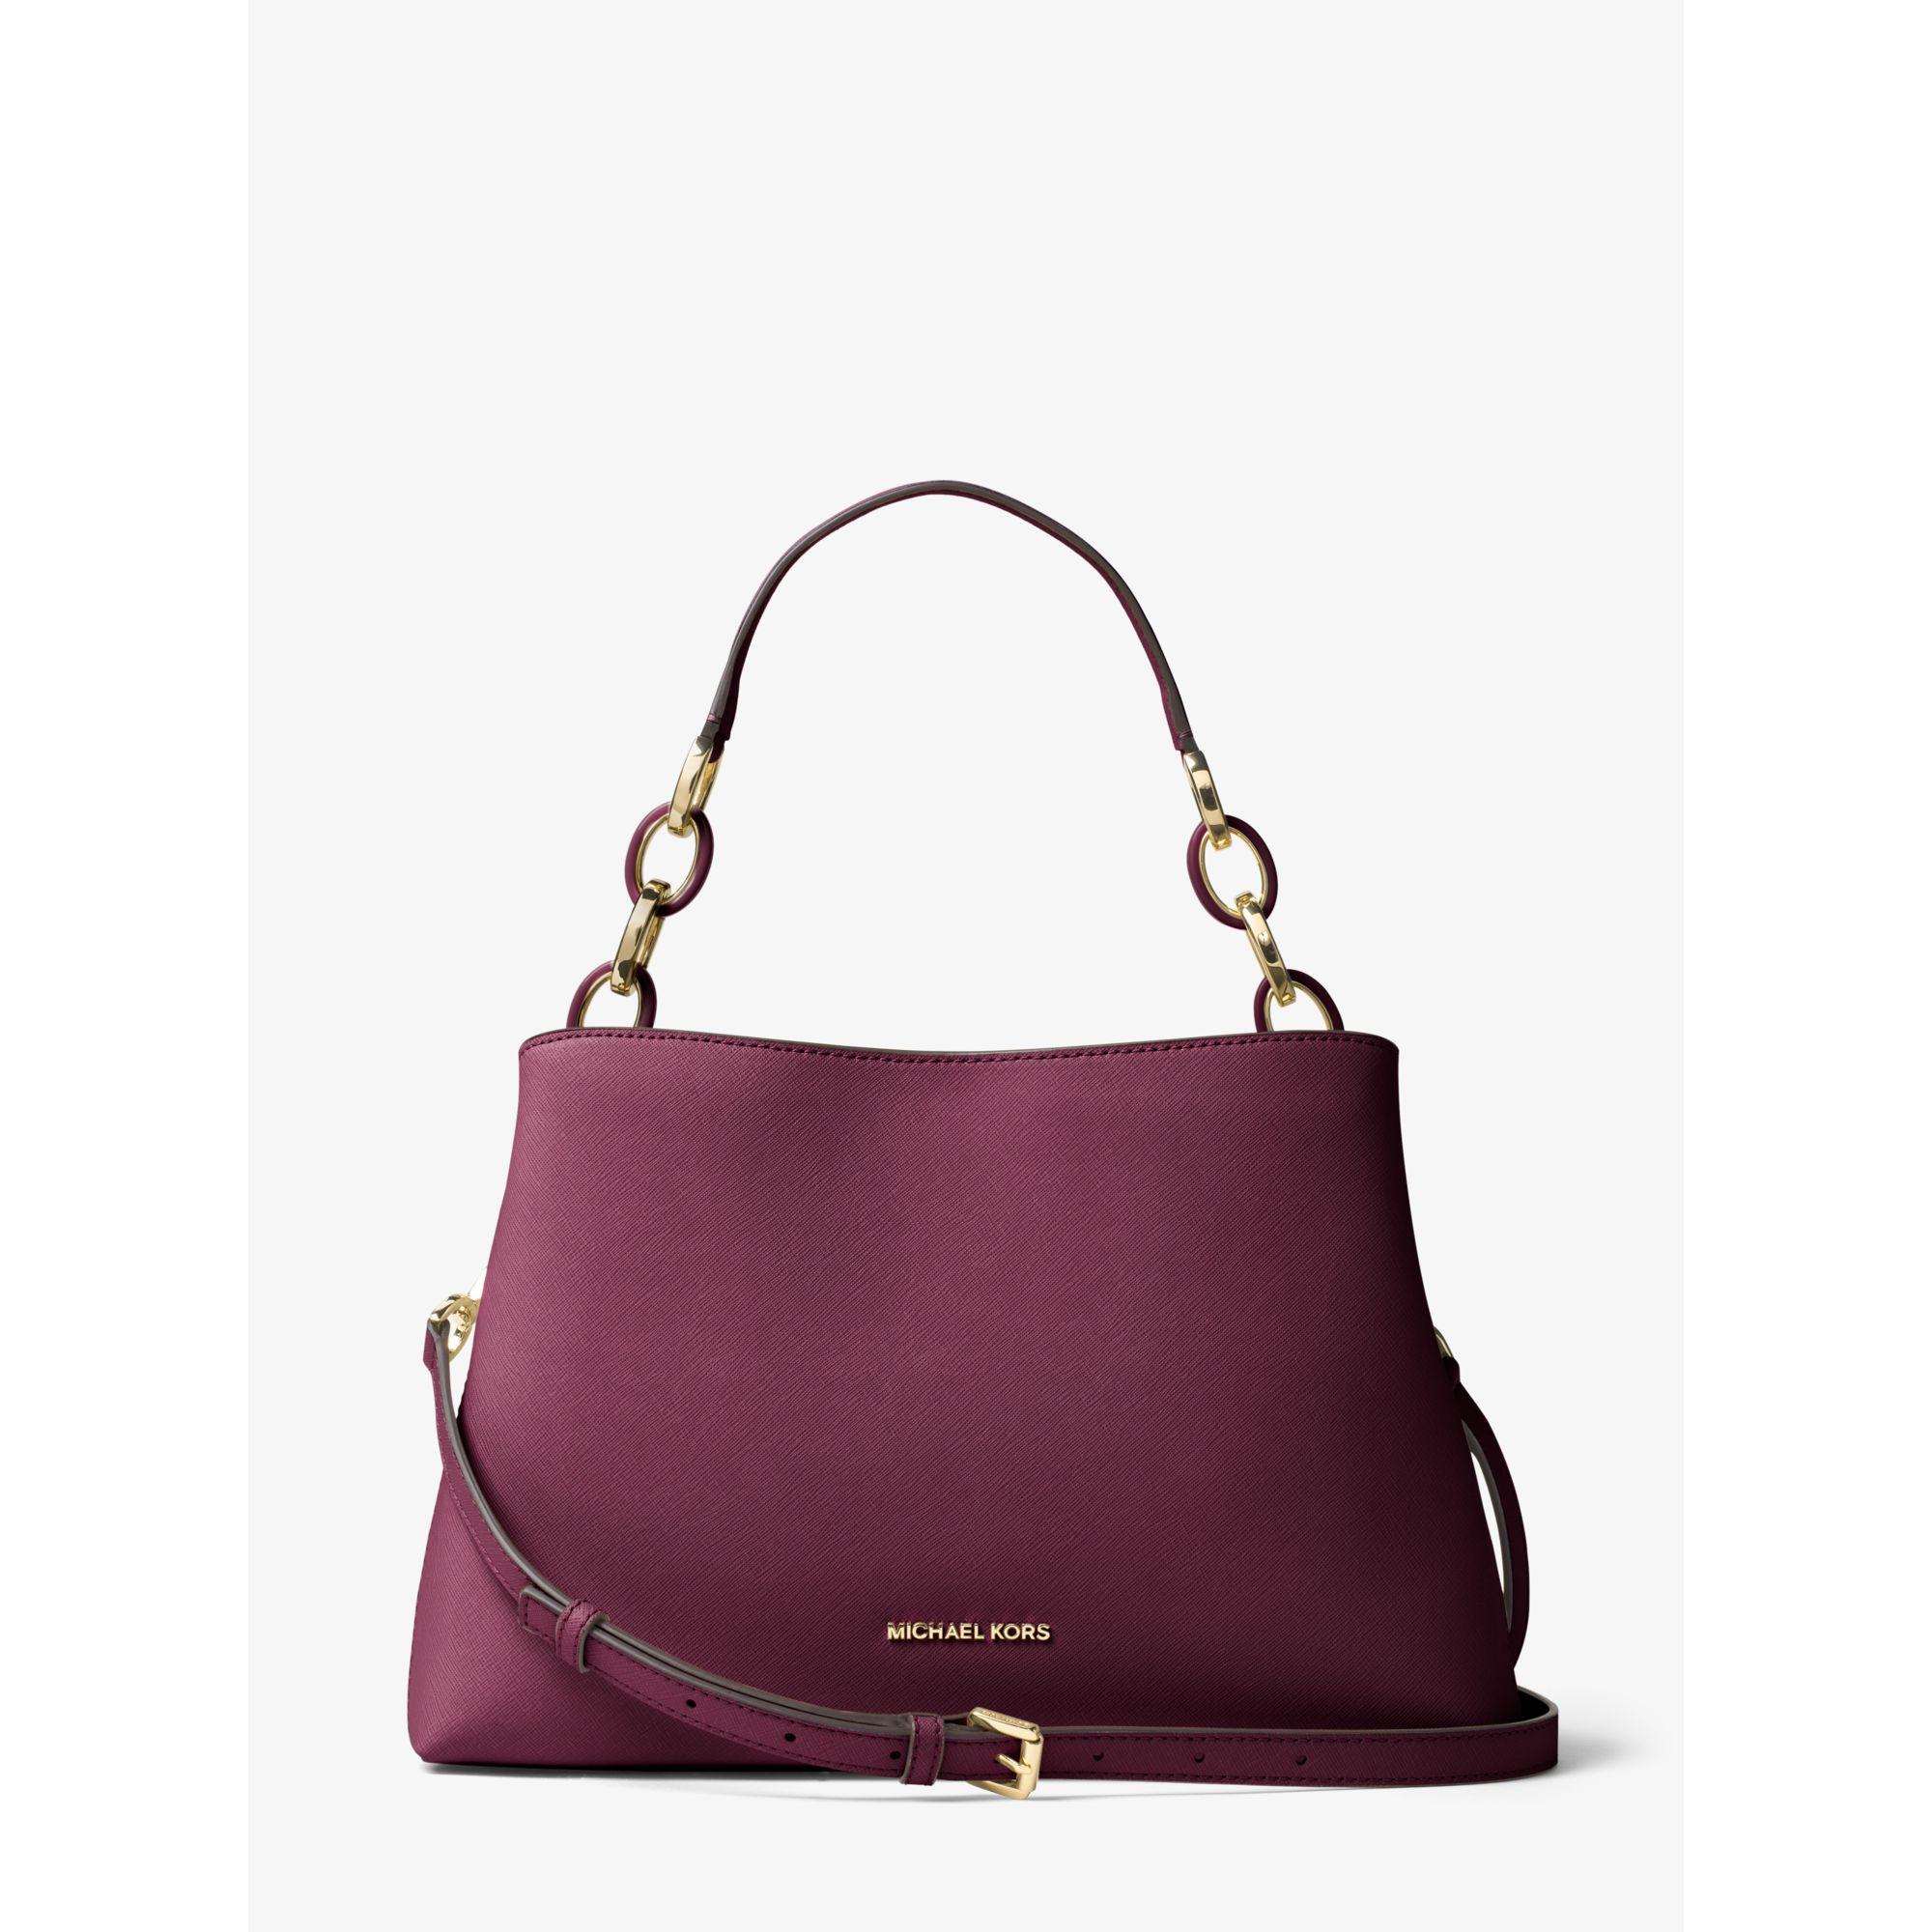 Michael kors Portia Large Saffiano Leather Shoulder Bag in Purple ...